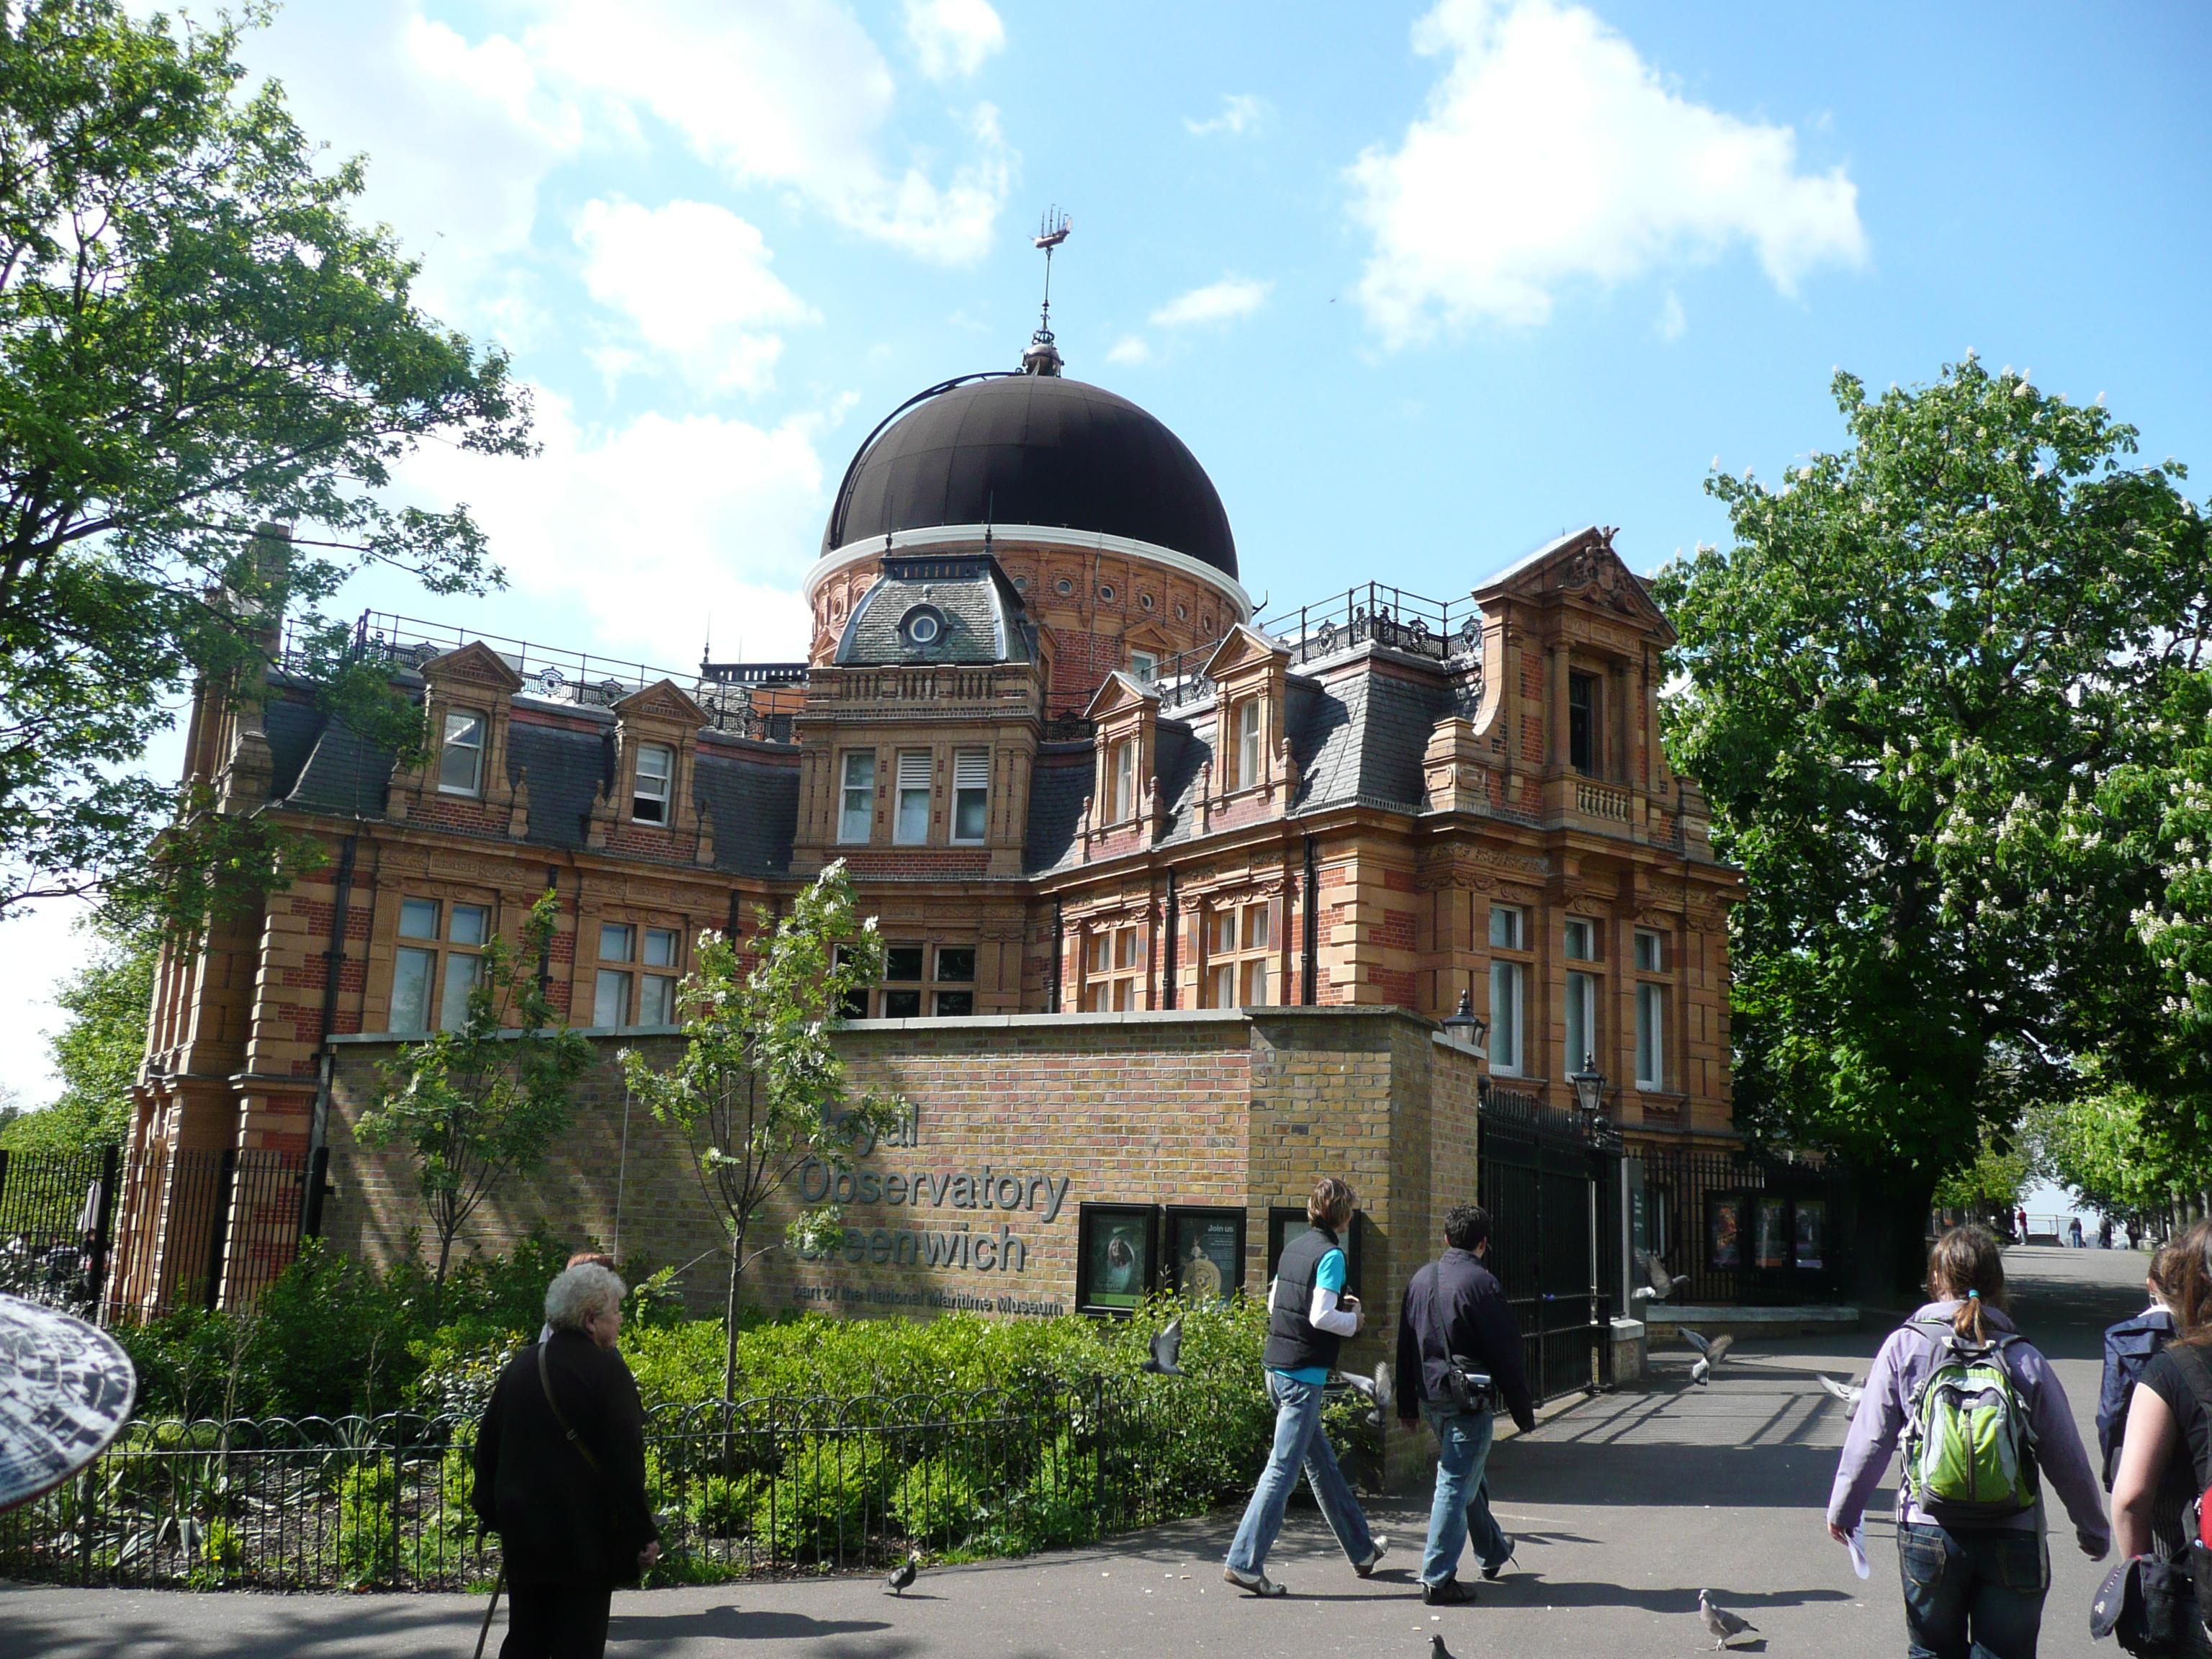 125 Year Royal Observatory In Greeniwch London Where